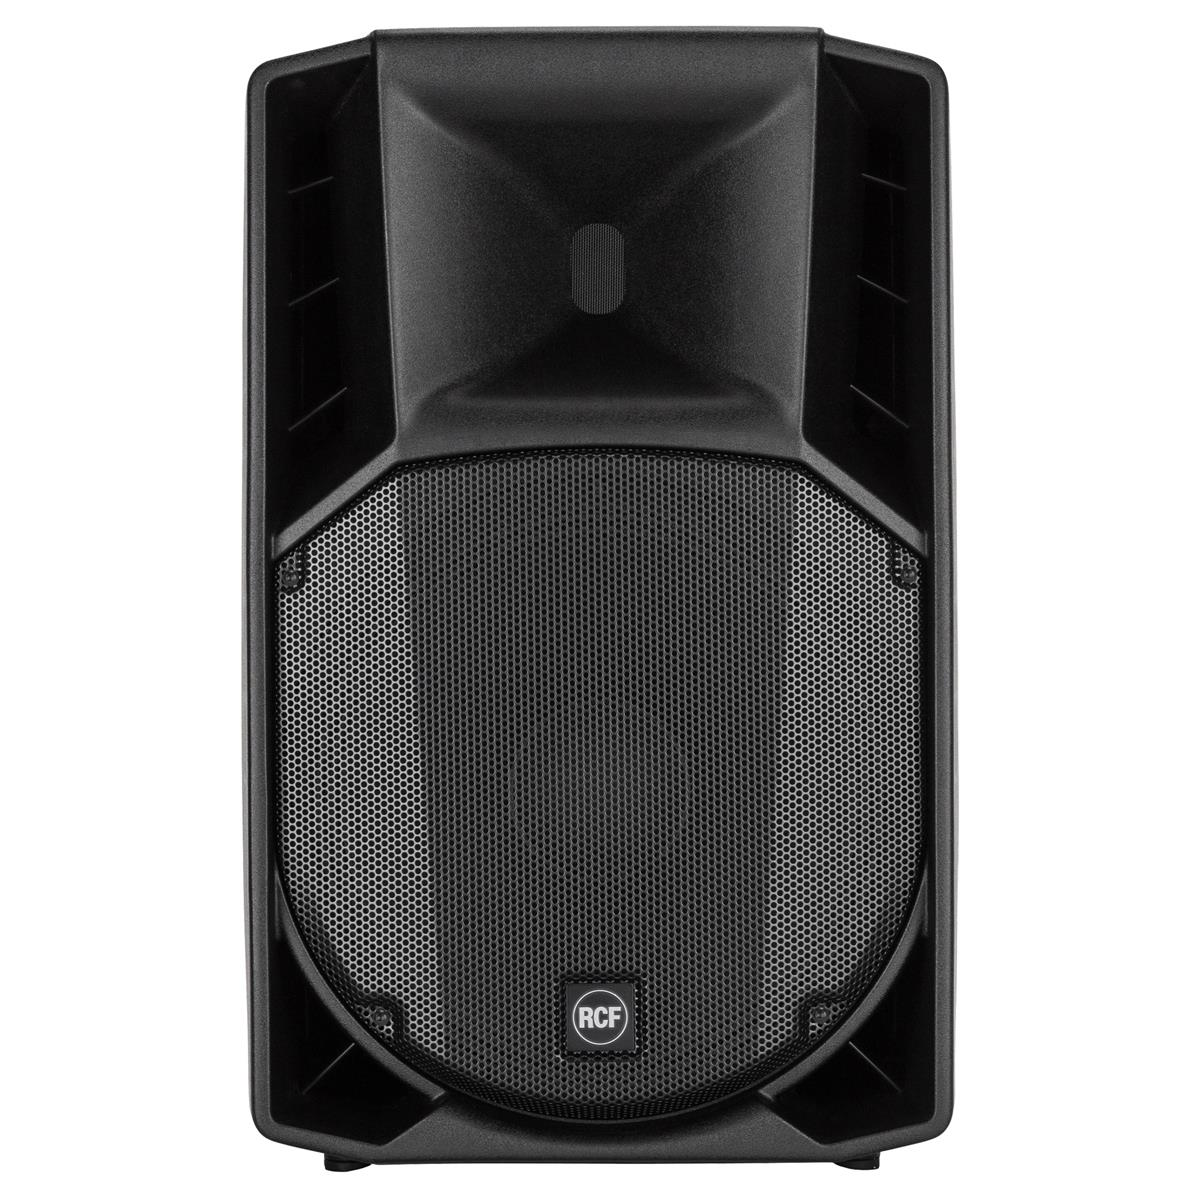 RCF ART 725 MK4 Speaker system 15in + 2in, 700Wrms, 1400Wpea